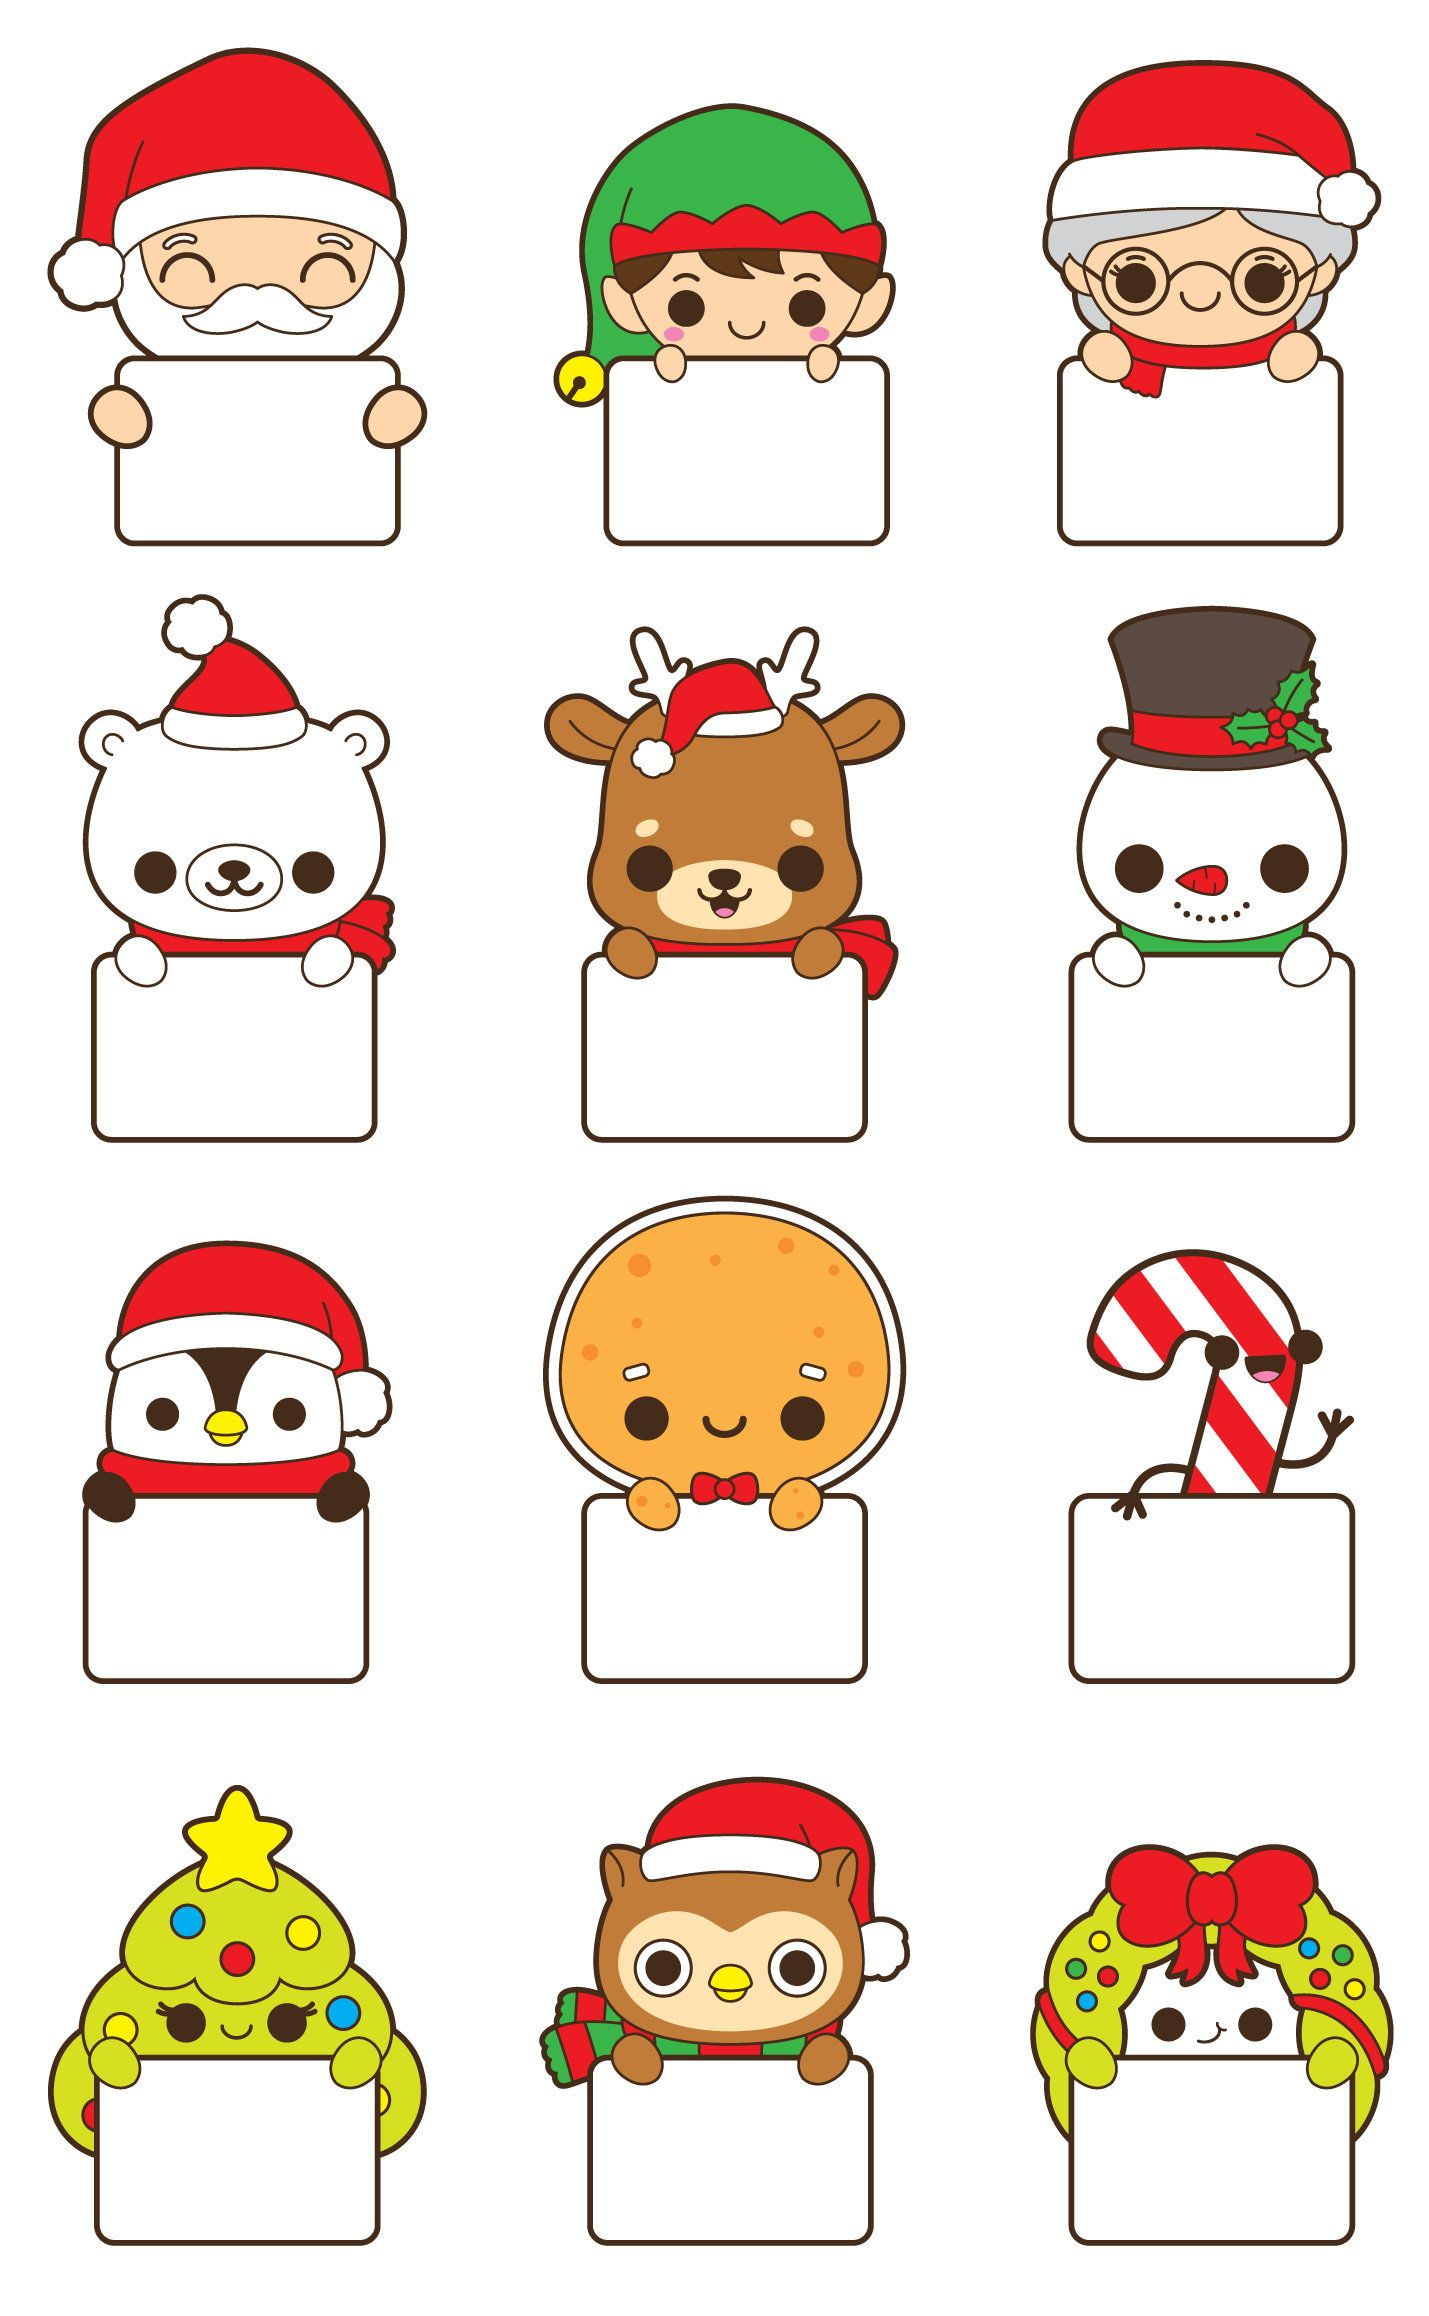 Imagenes Predisenadas De Caramelo De Navidad Imagenes Etsy Kawaii Christmas Easy Christmas Drawings Christmas Drawing